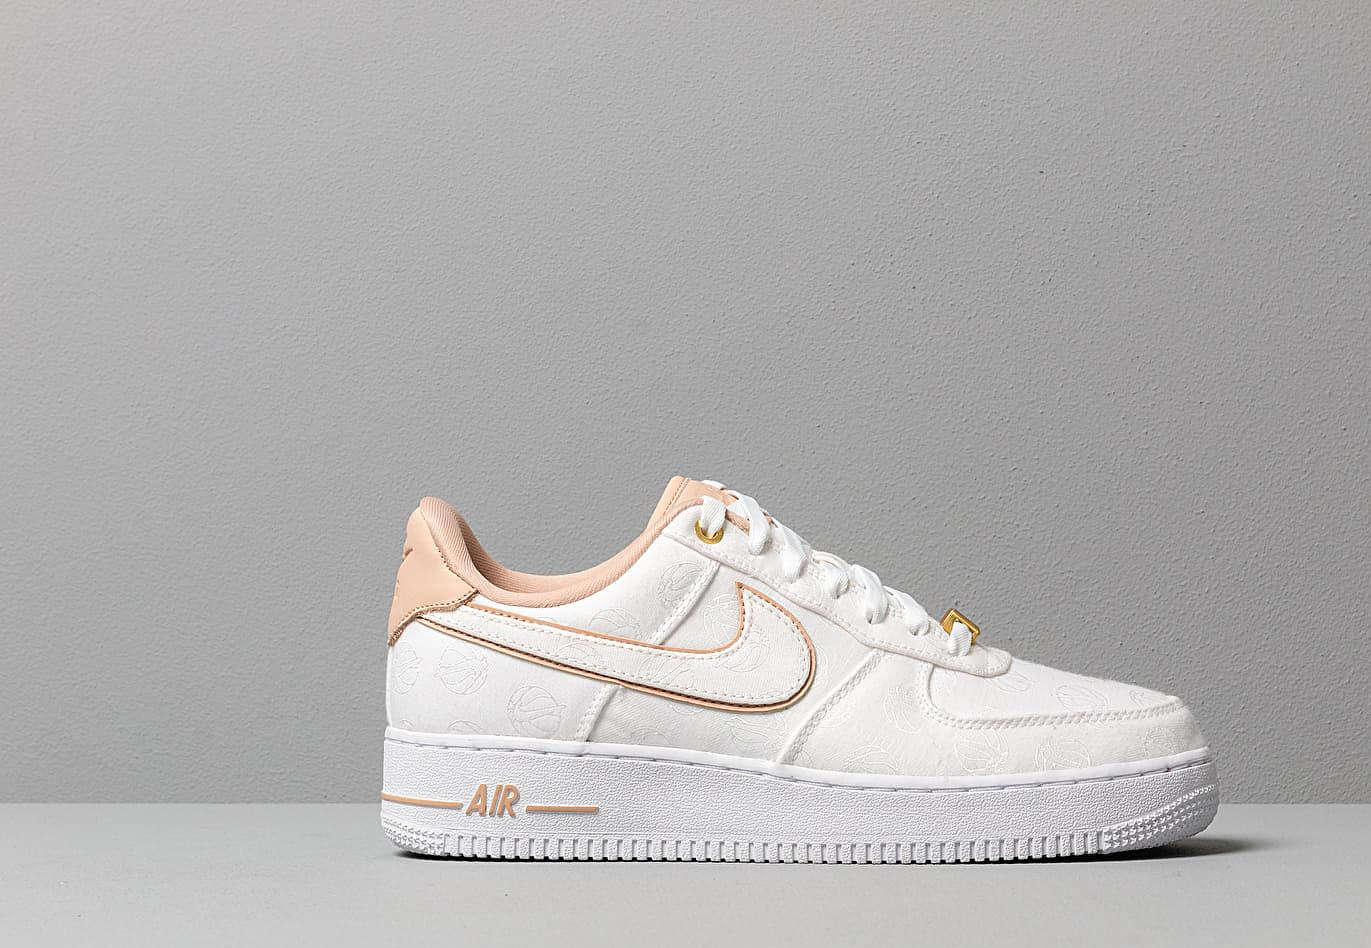 Wmns Air Force 1 '07 Lx White/ Bio Beige-White-Metallic Gold Nike ...